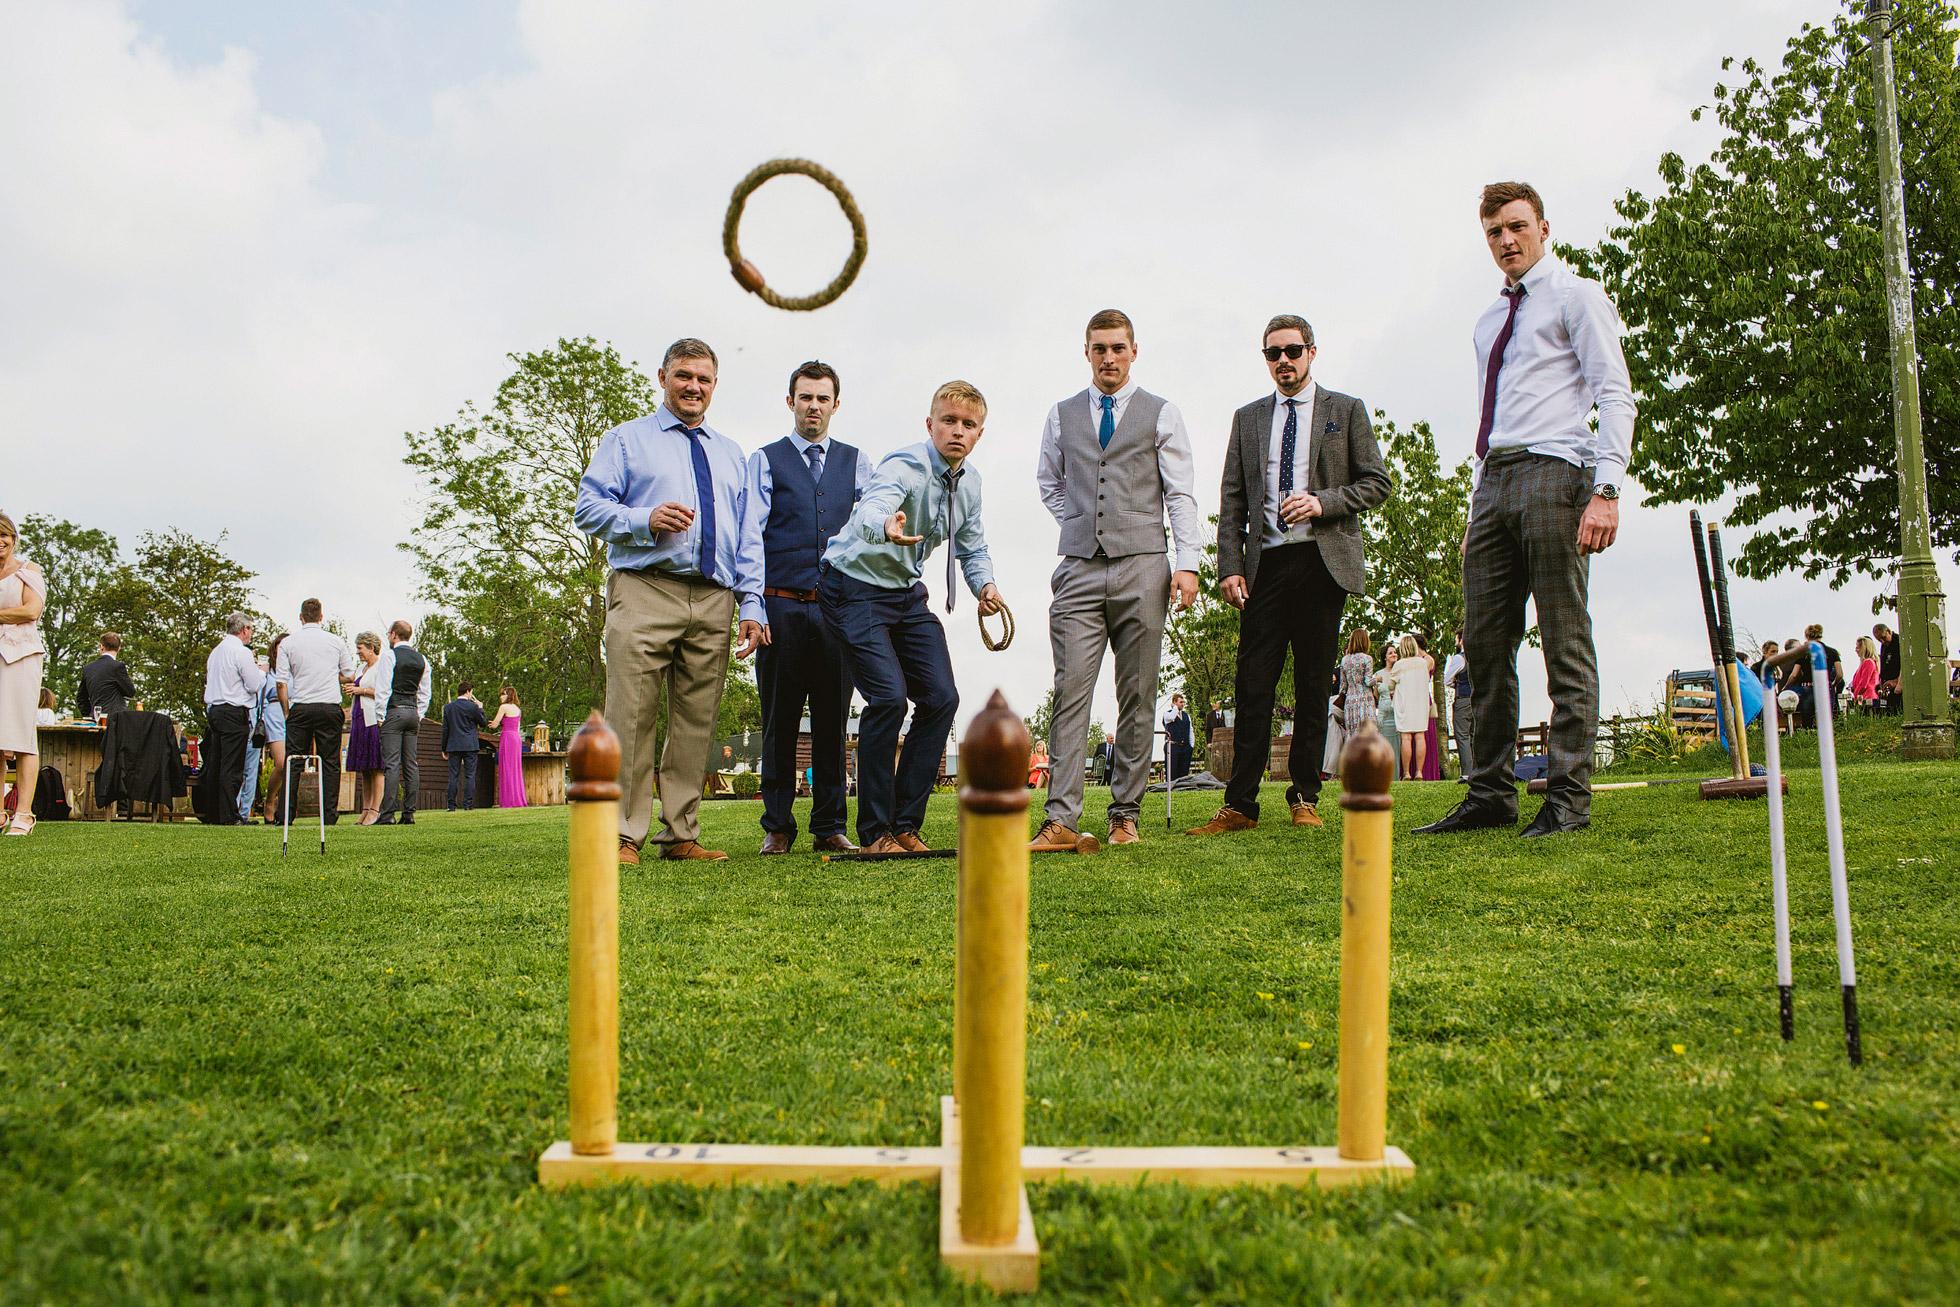 Skipton Country Weddings Hoopla games